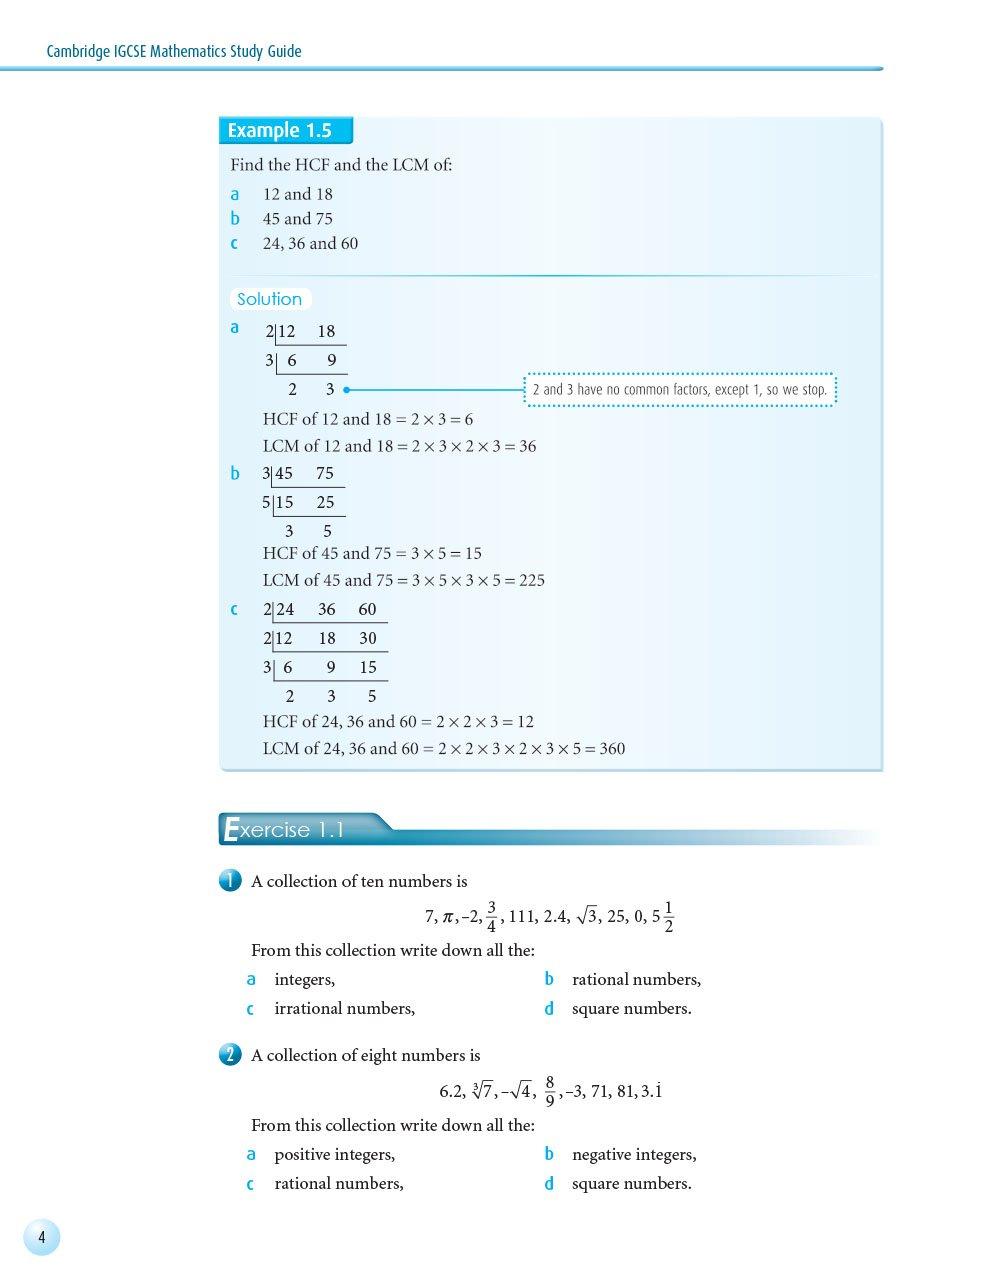 Cambridge IGCSE Mathematics Study Guide: David Ollerearnshaw, Benson Chow,  NTK Publishing Team: 9789881486981: Amazon.com: Books